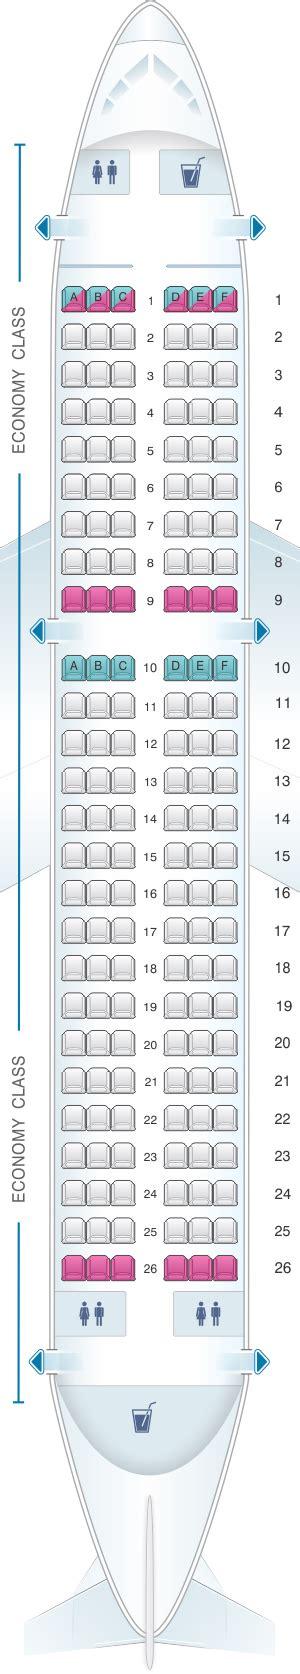 plan siege avion easyjet plan de cabine easyjet airbus a319 seatmaestro fr